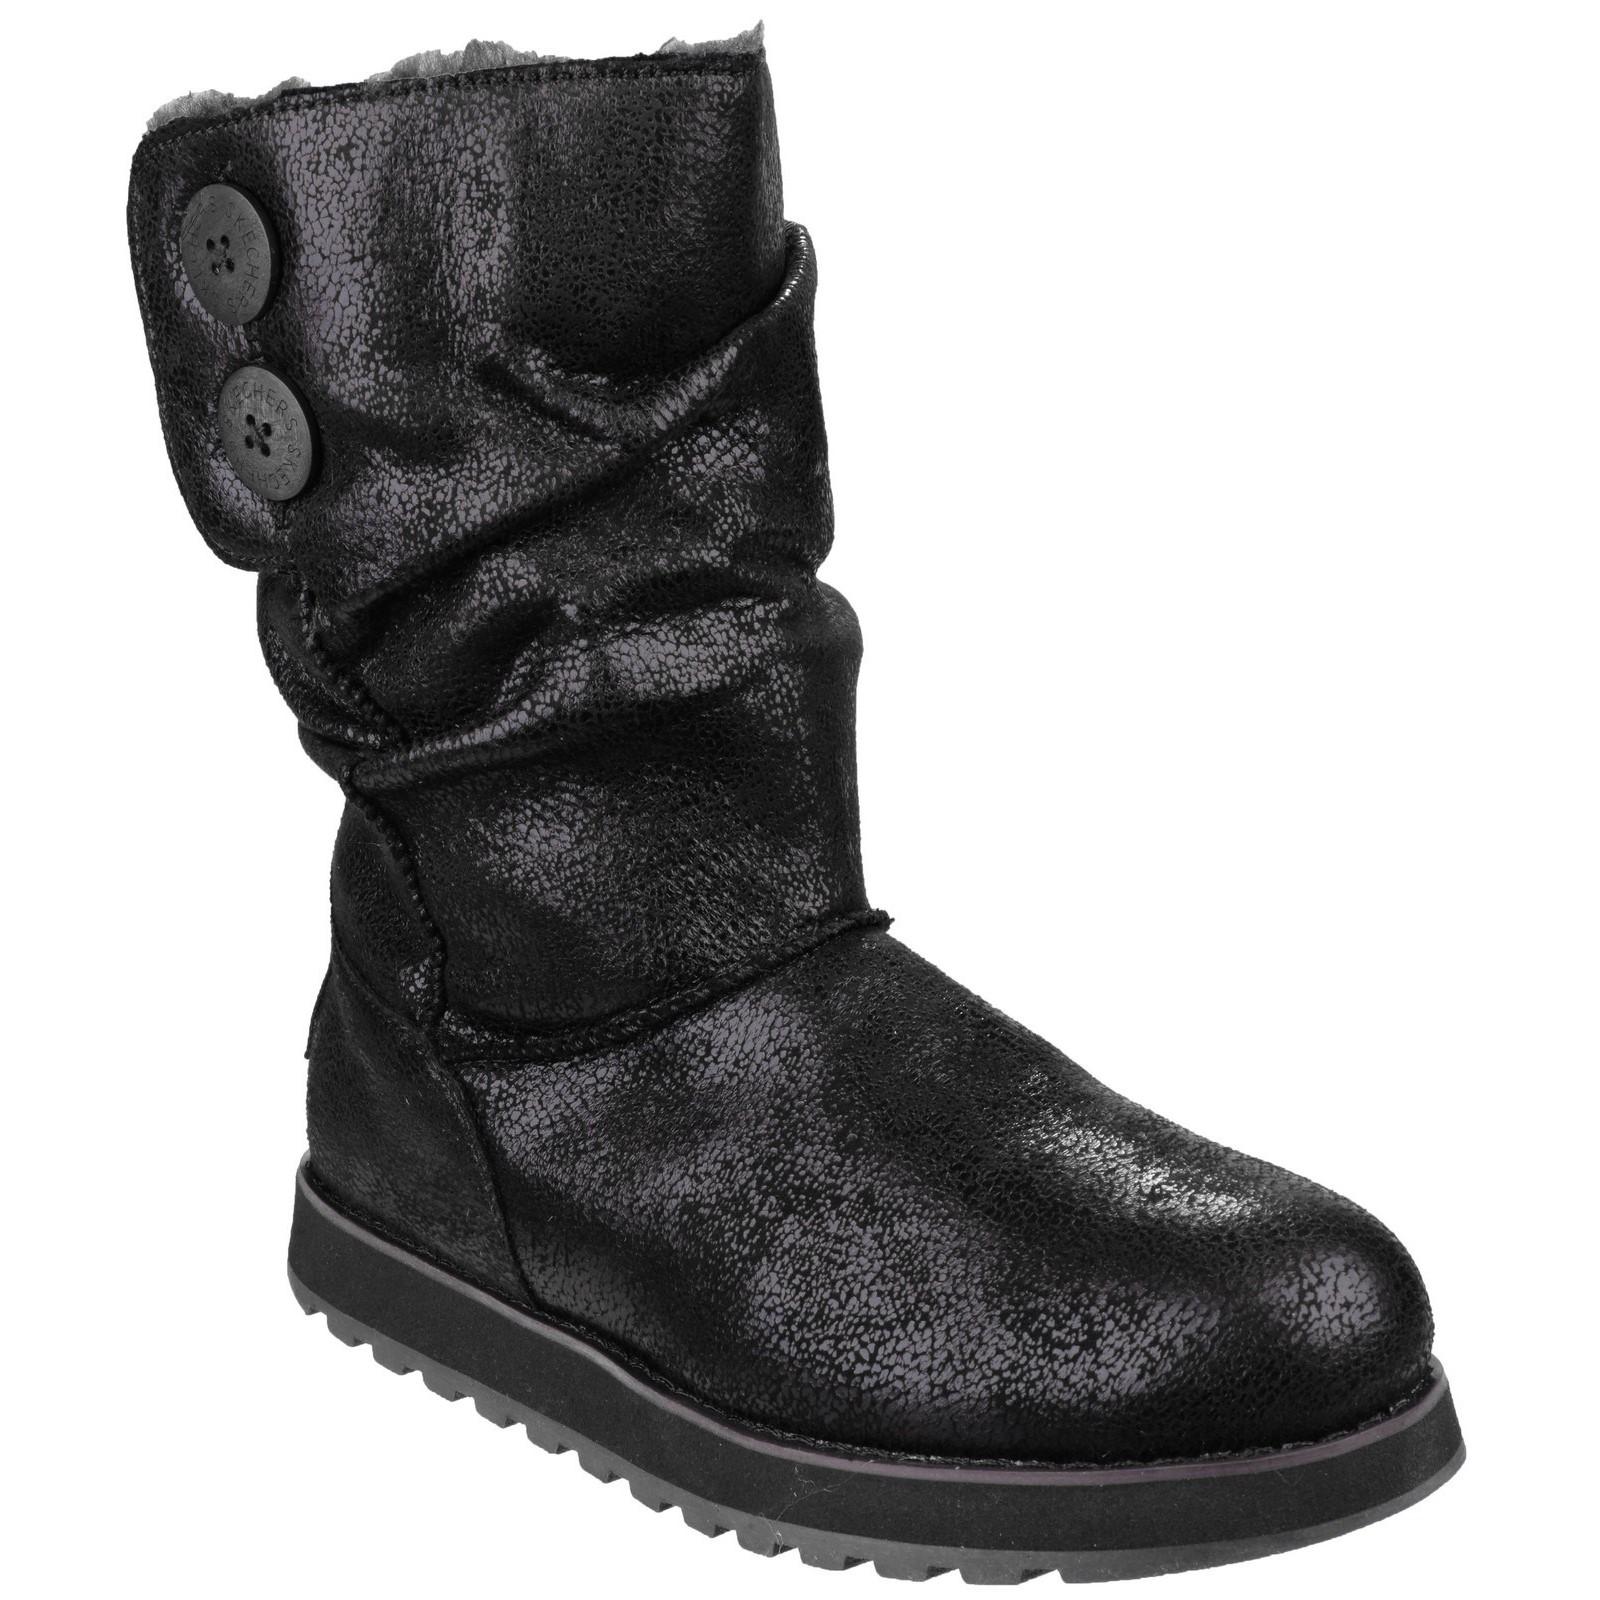 low priced 754ad 9f5fa ... Nike Air Jordan Jordan Jordan Trunner LX High AA1347-021 Black White  Gold Gum Sole ...